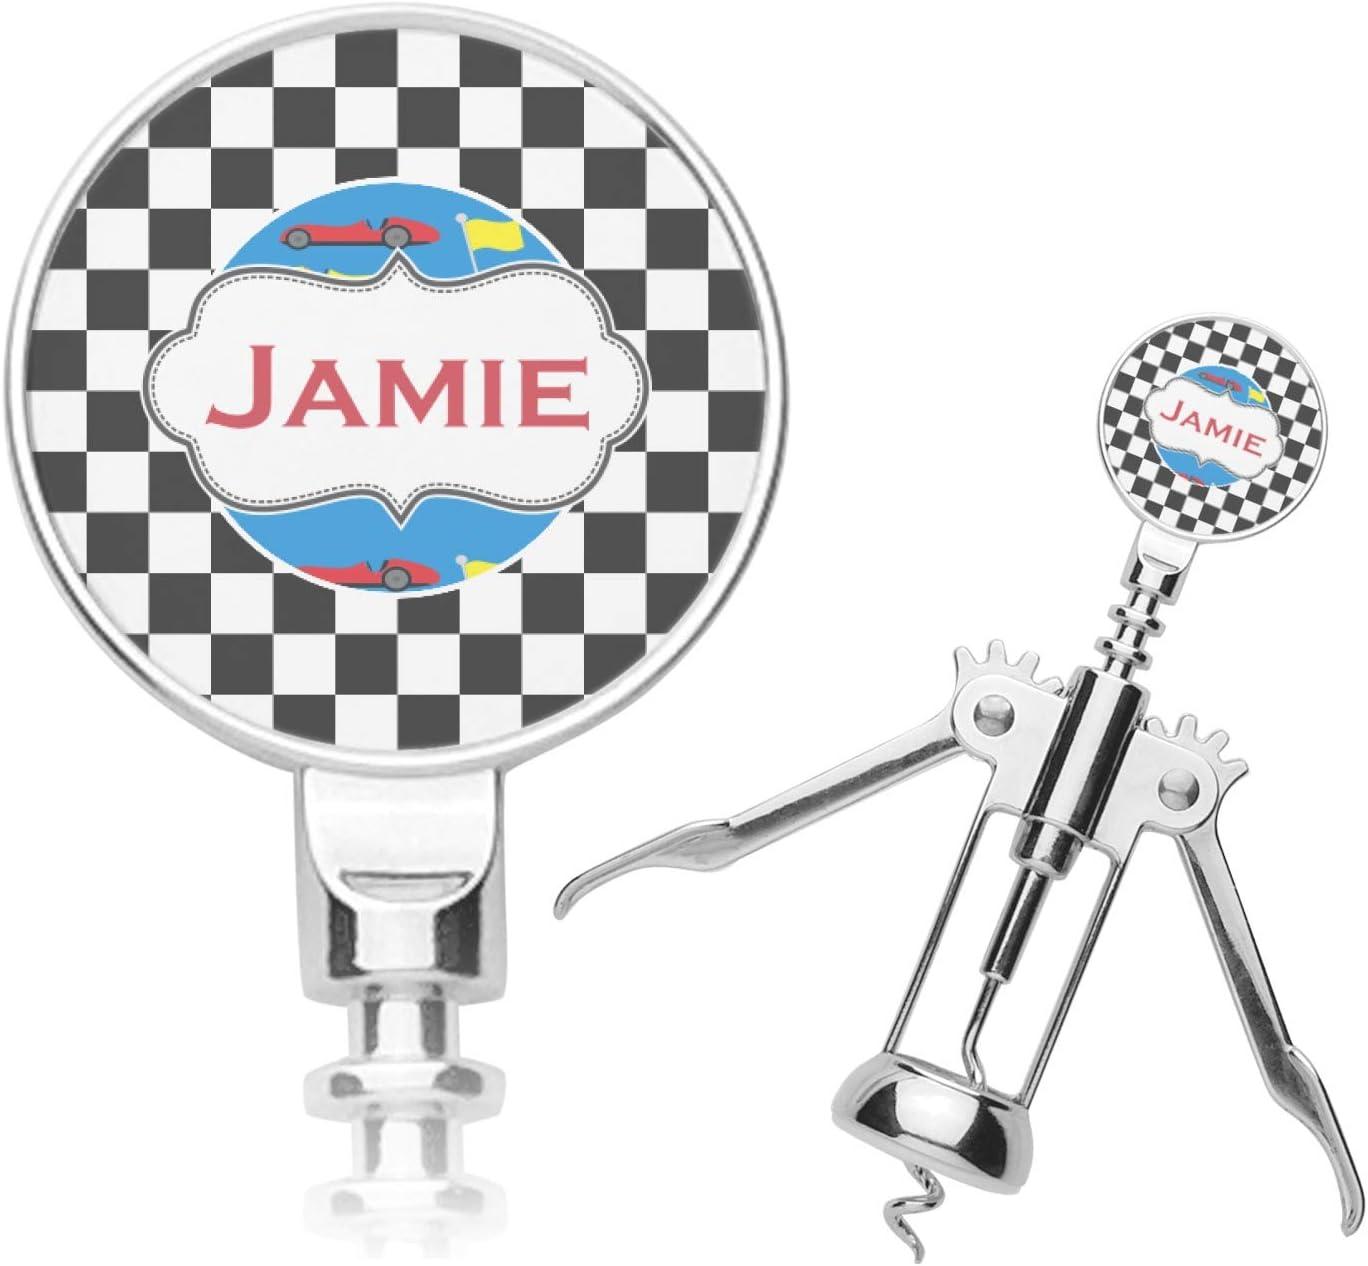 Checkers Racecars favorite Personalized Bargain sale Corkscrew